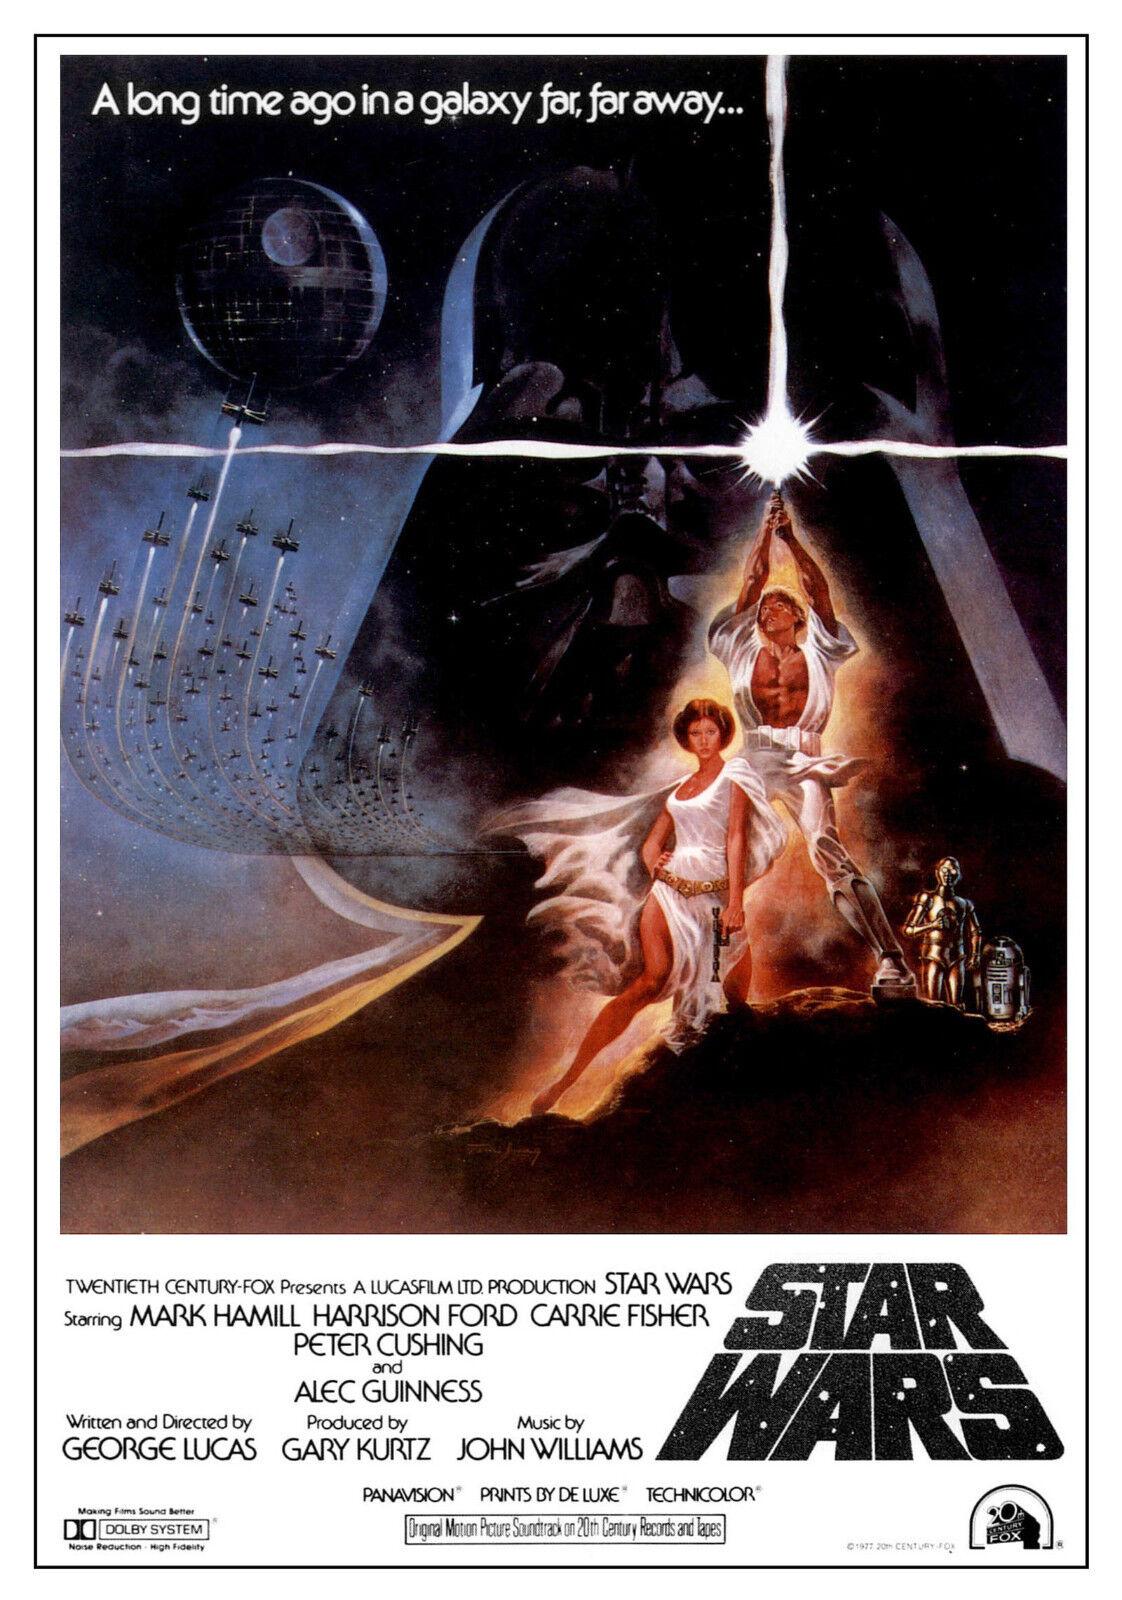 STAR WARS MOVIE POSTERS - Classic Movie Artwork